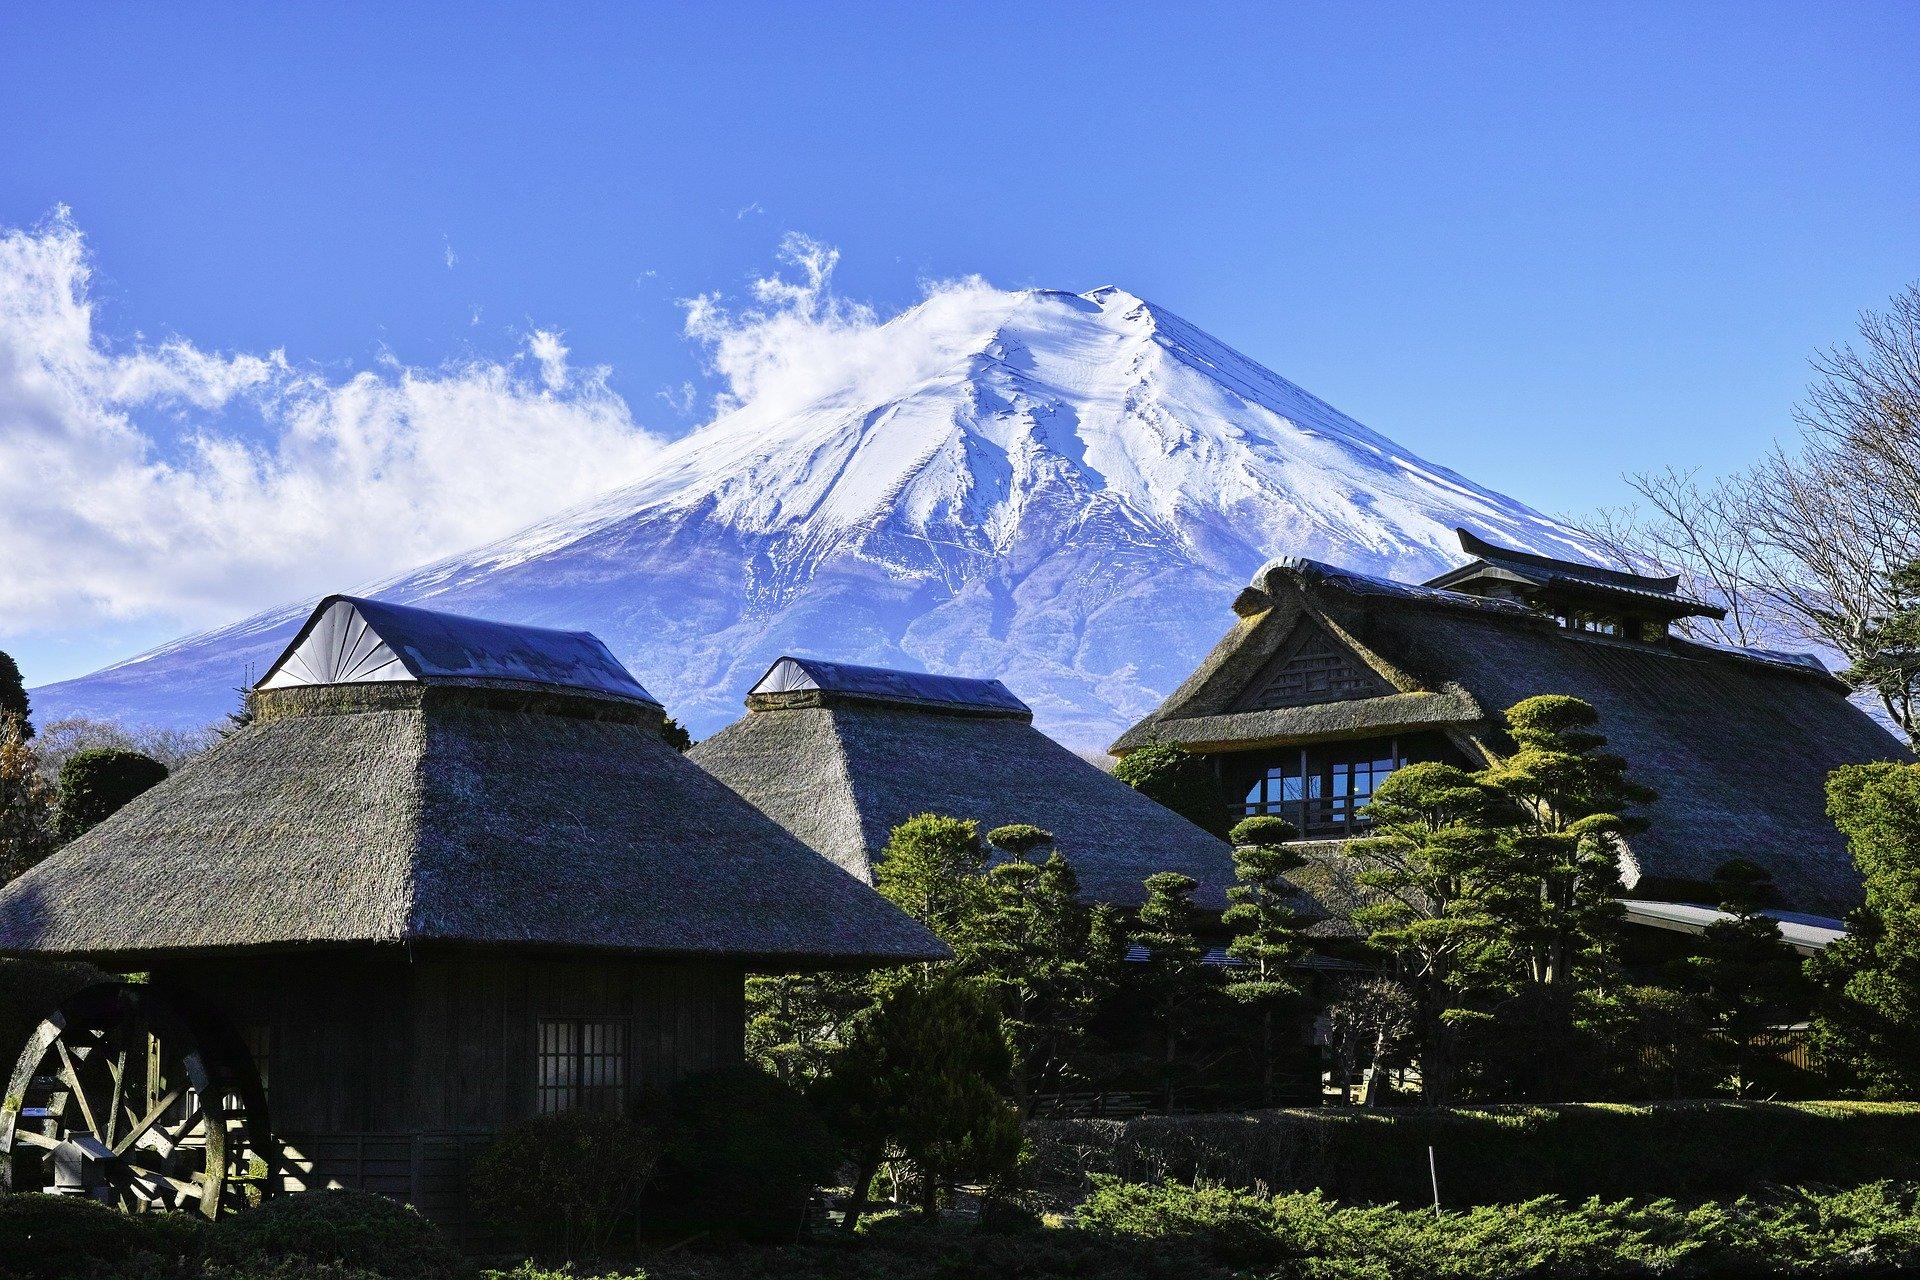 La cara oculta del Monte Fuji